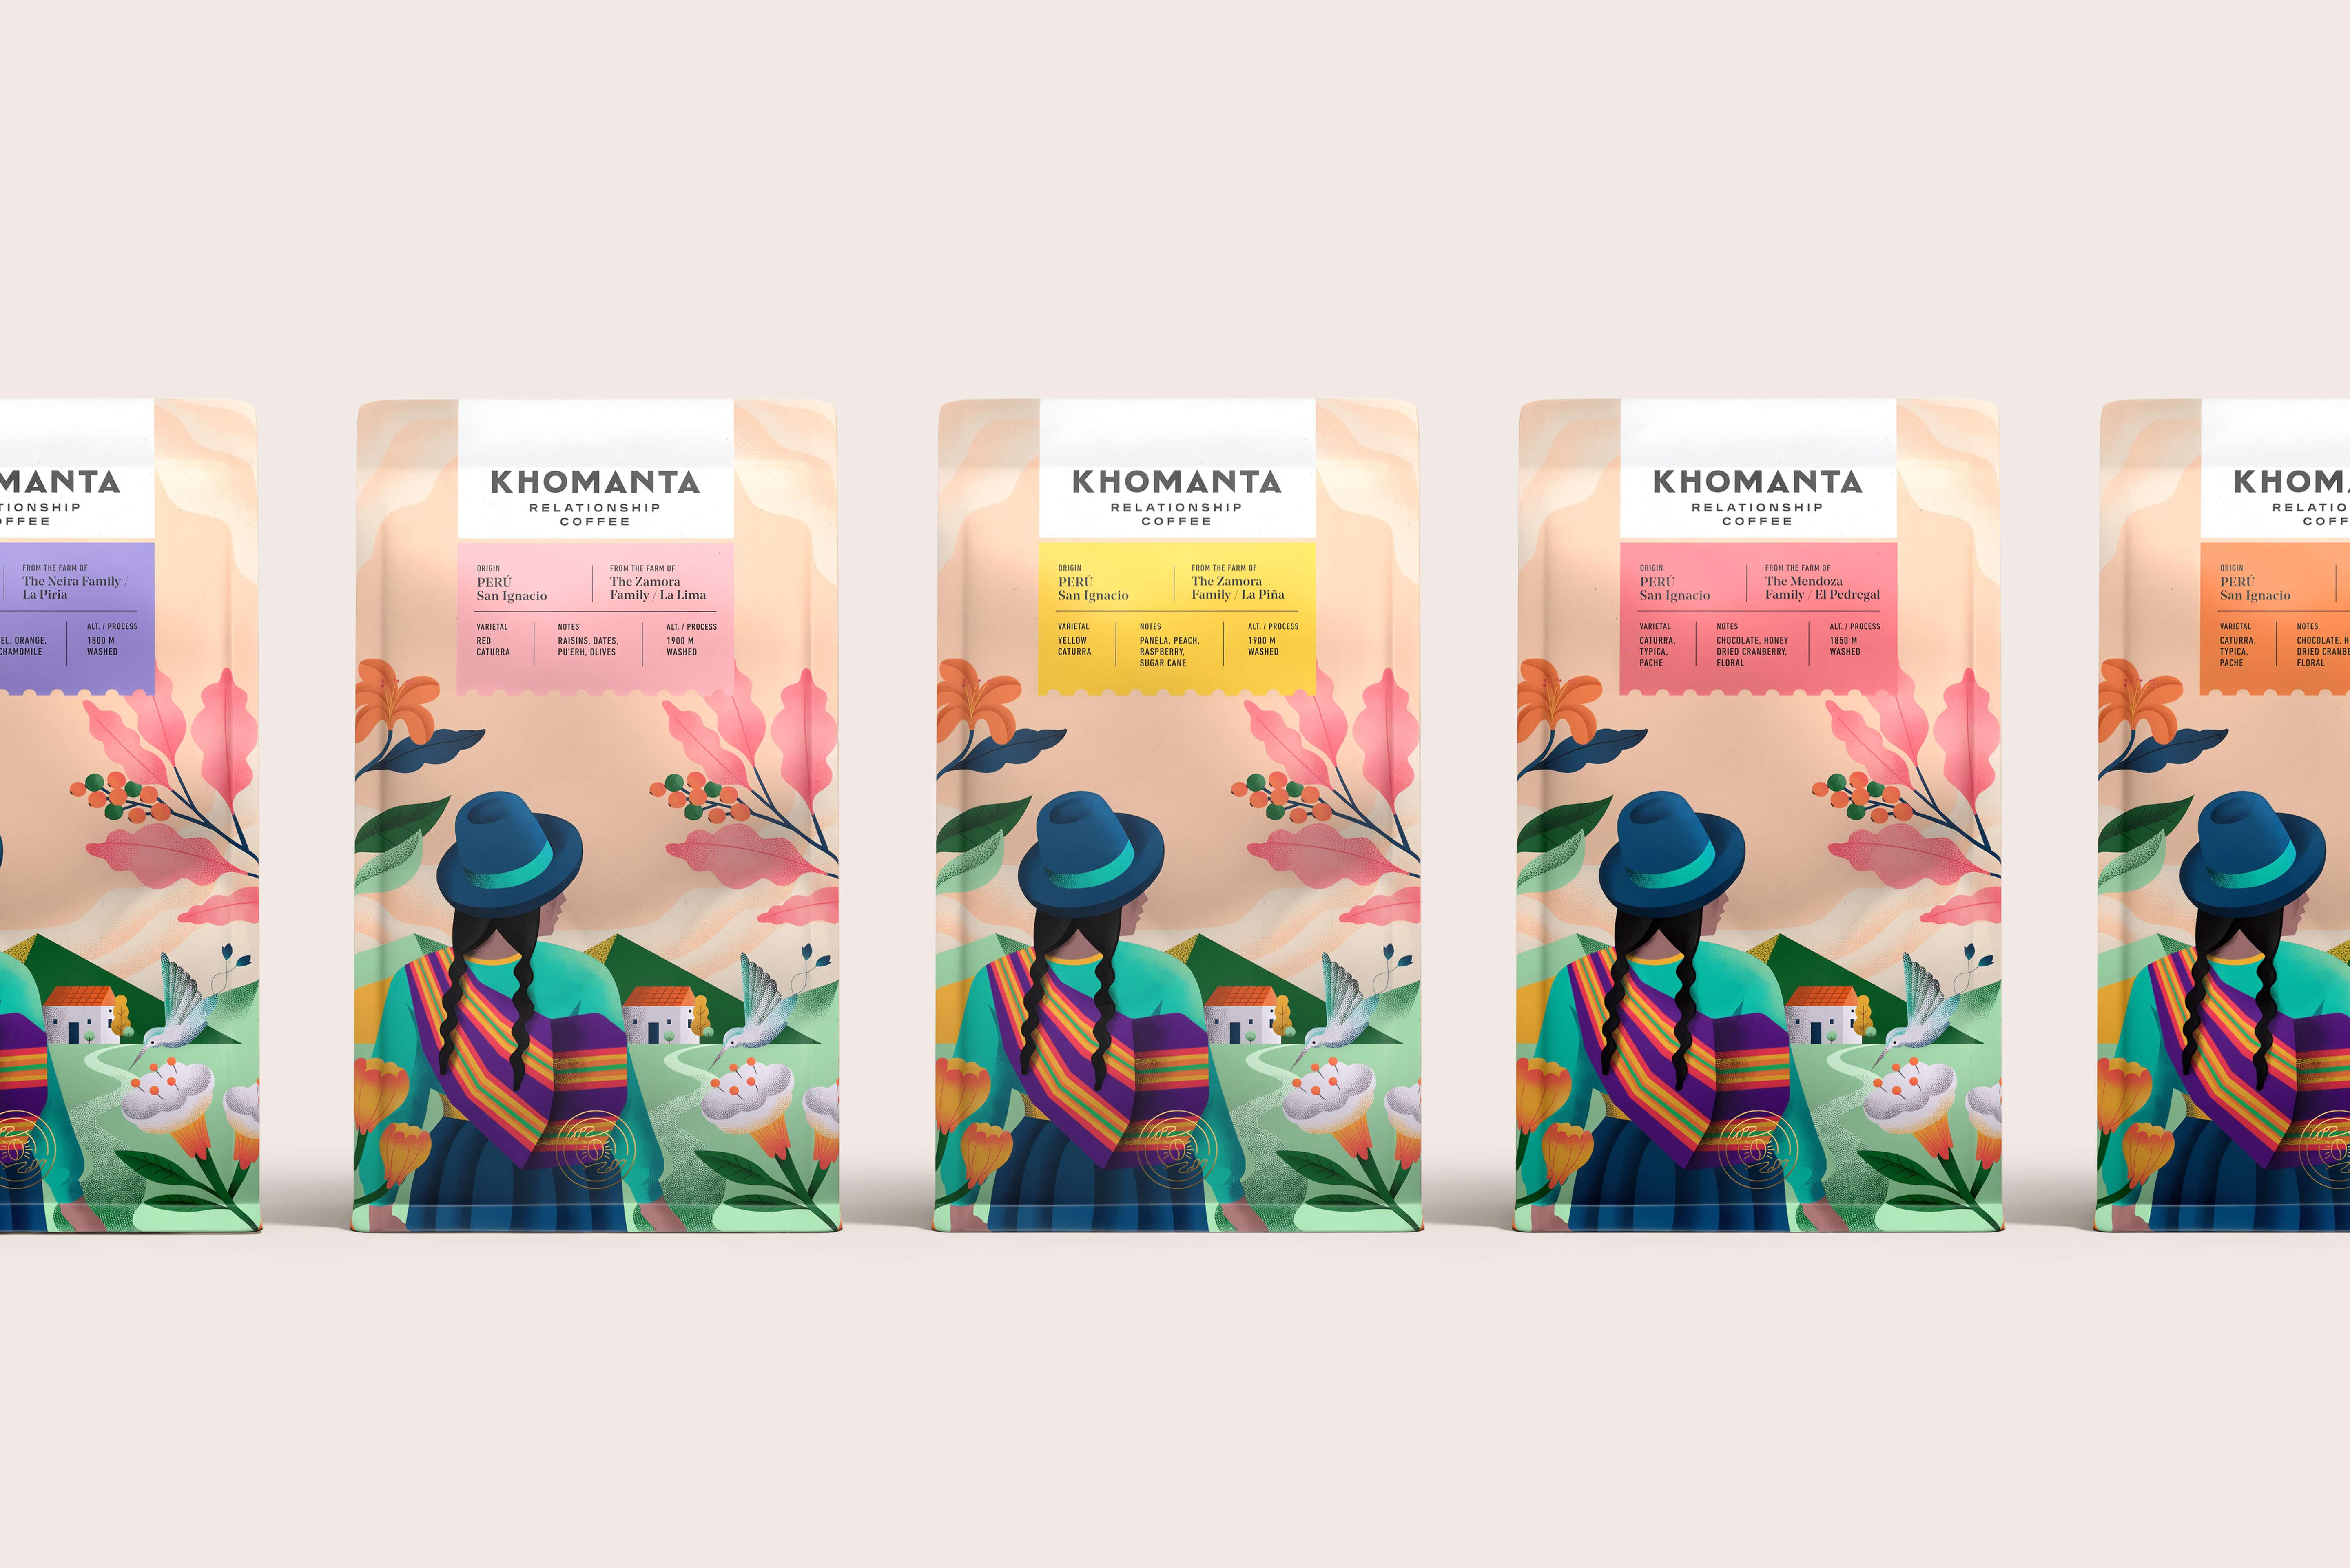 Southern Mountains of Peru Khomanta Coffee Packaging Design